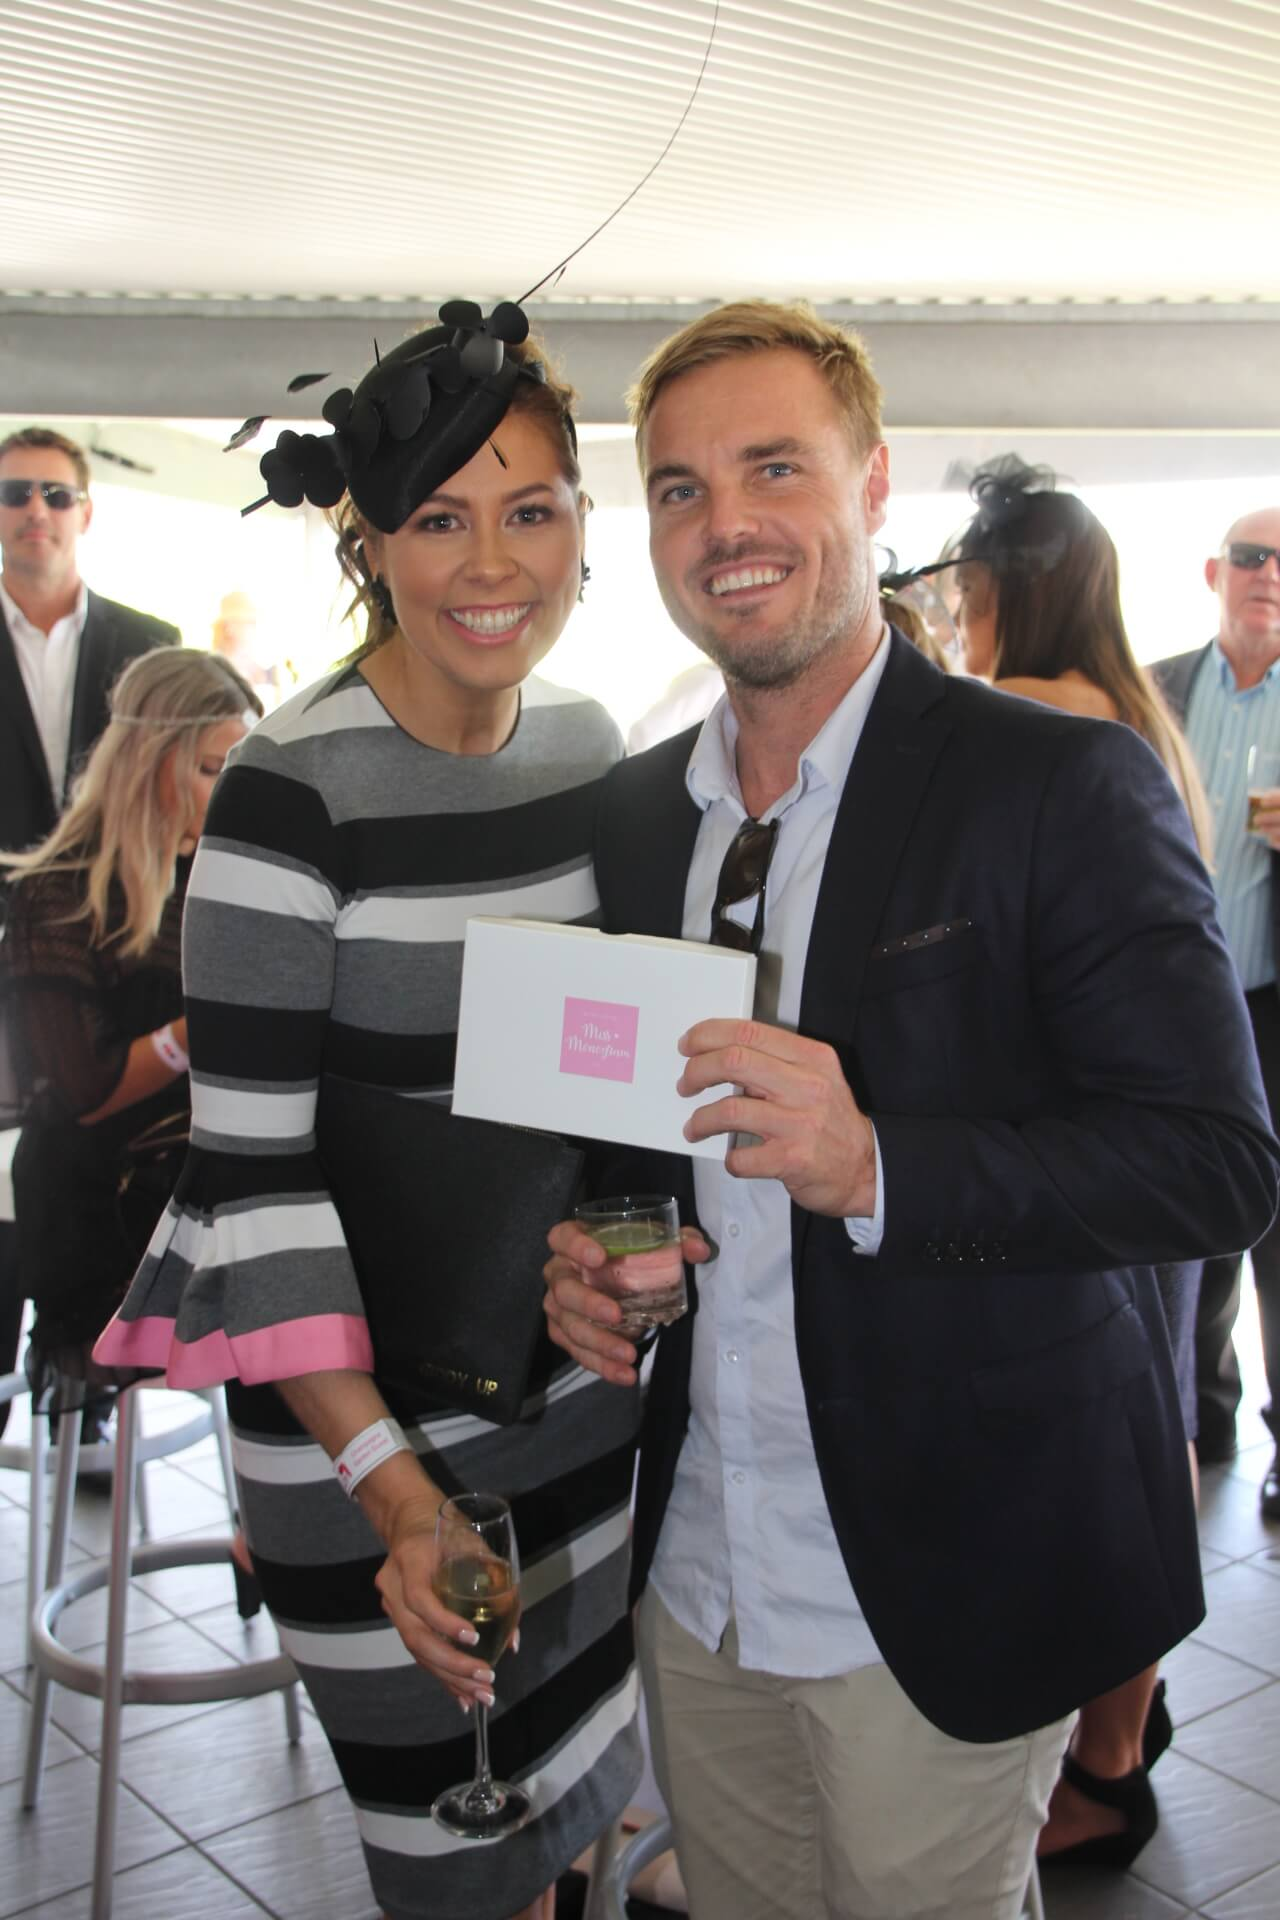 Natalie Tink, Craig Morrison (Best Dressed Male winner)